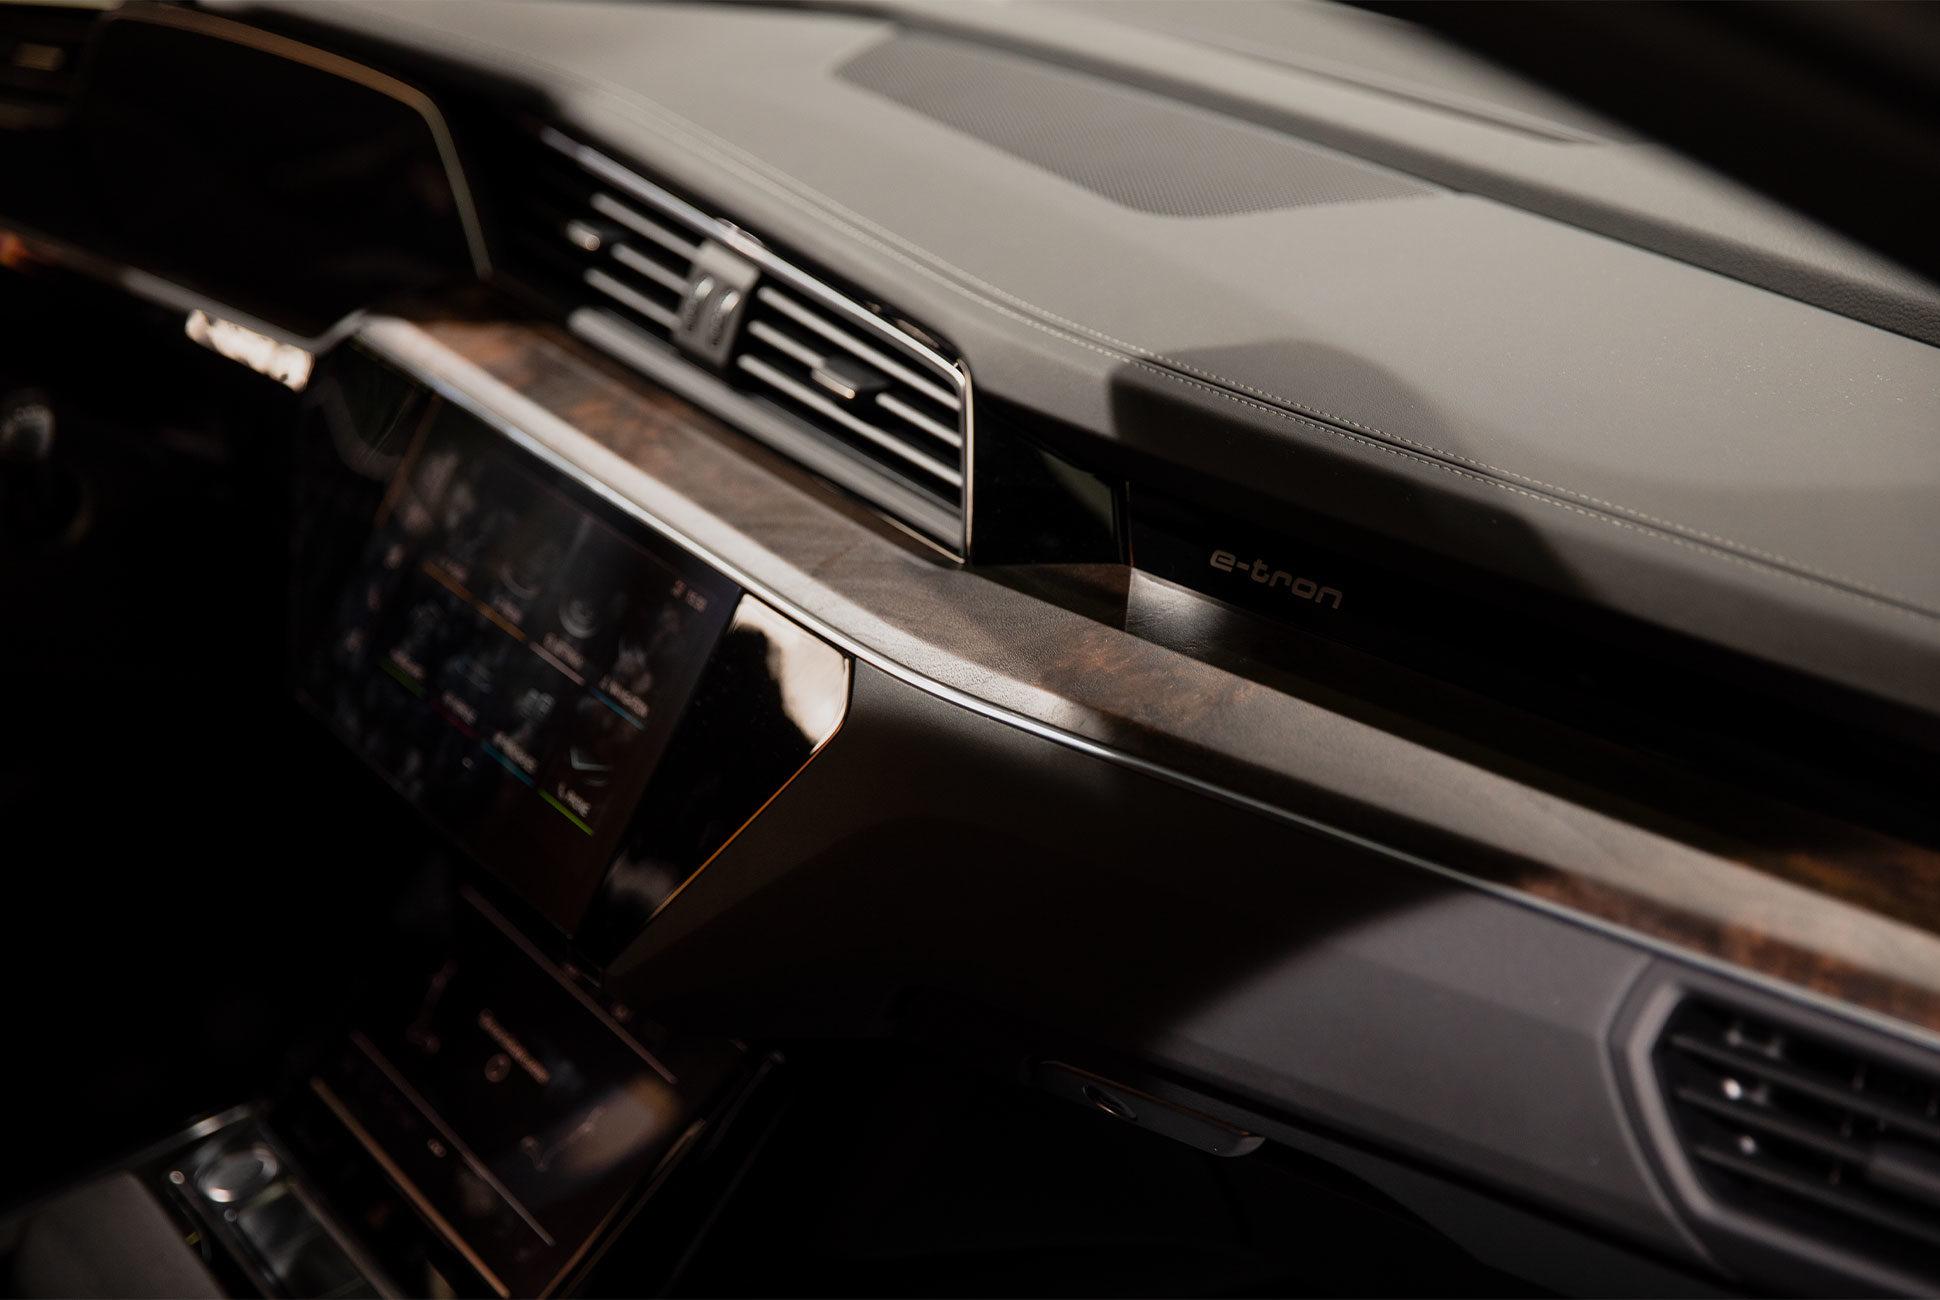 NYIAS-Details-Gear-Patrol-E-Tron-Slide-2